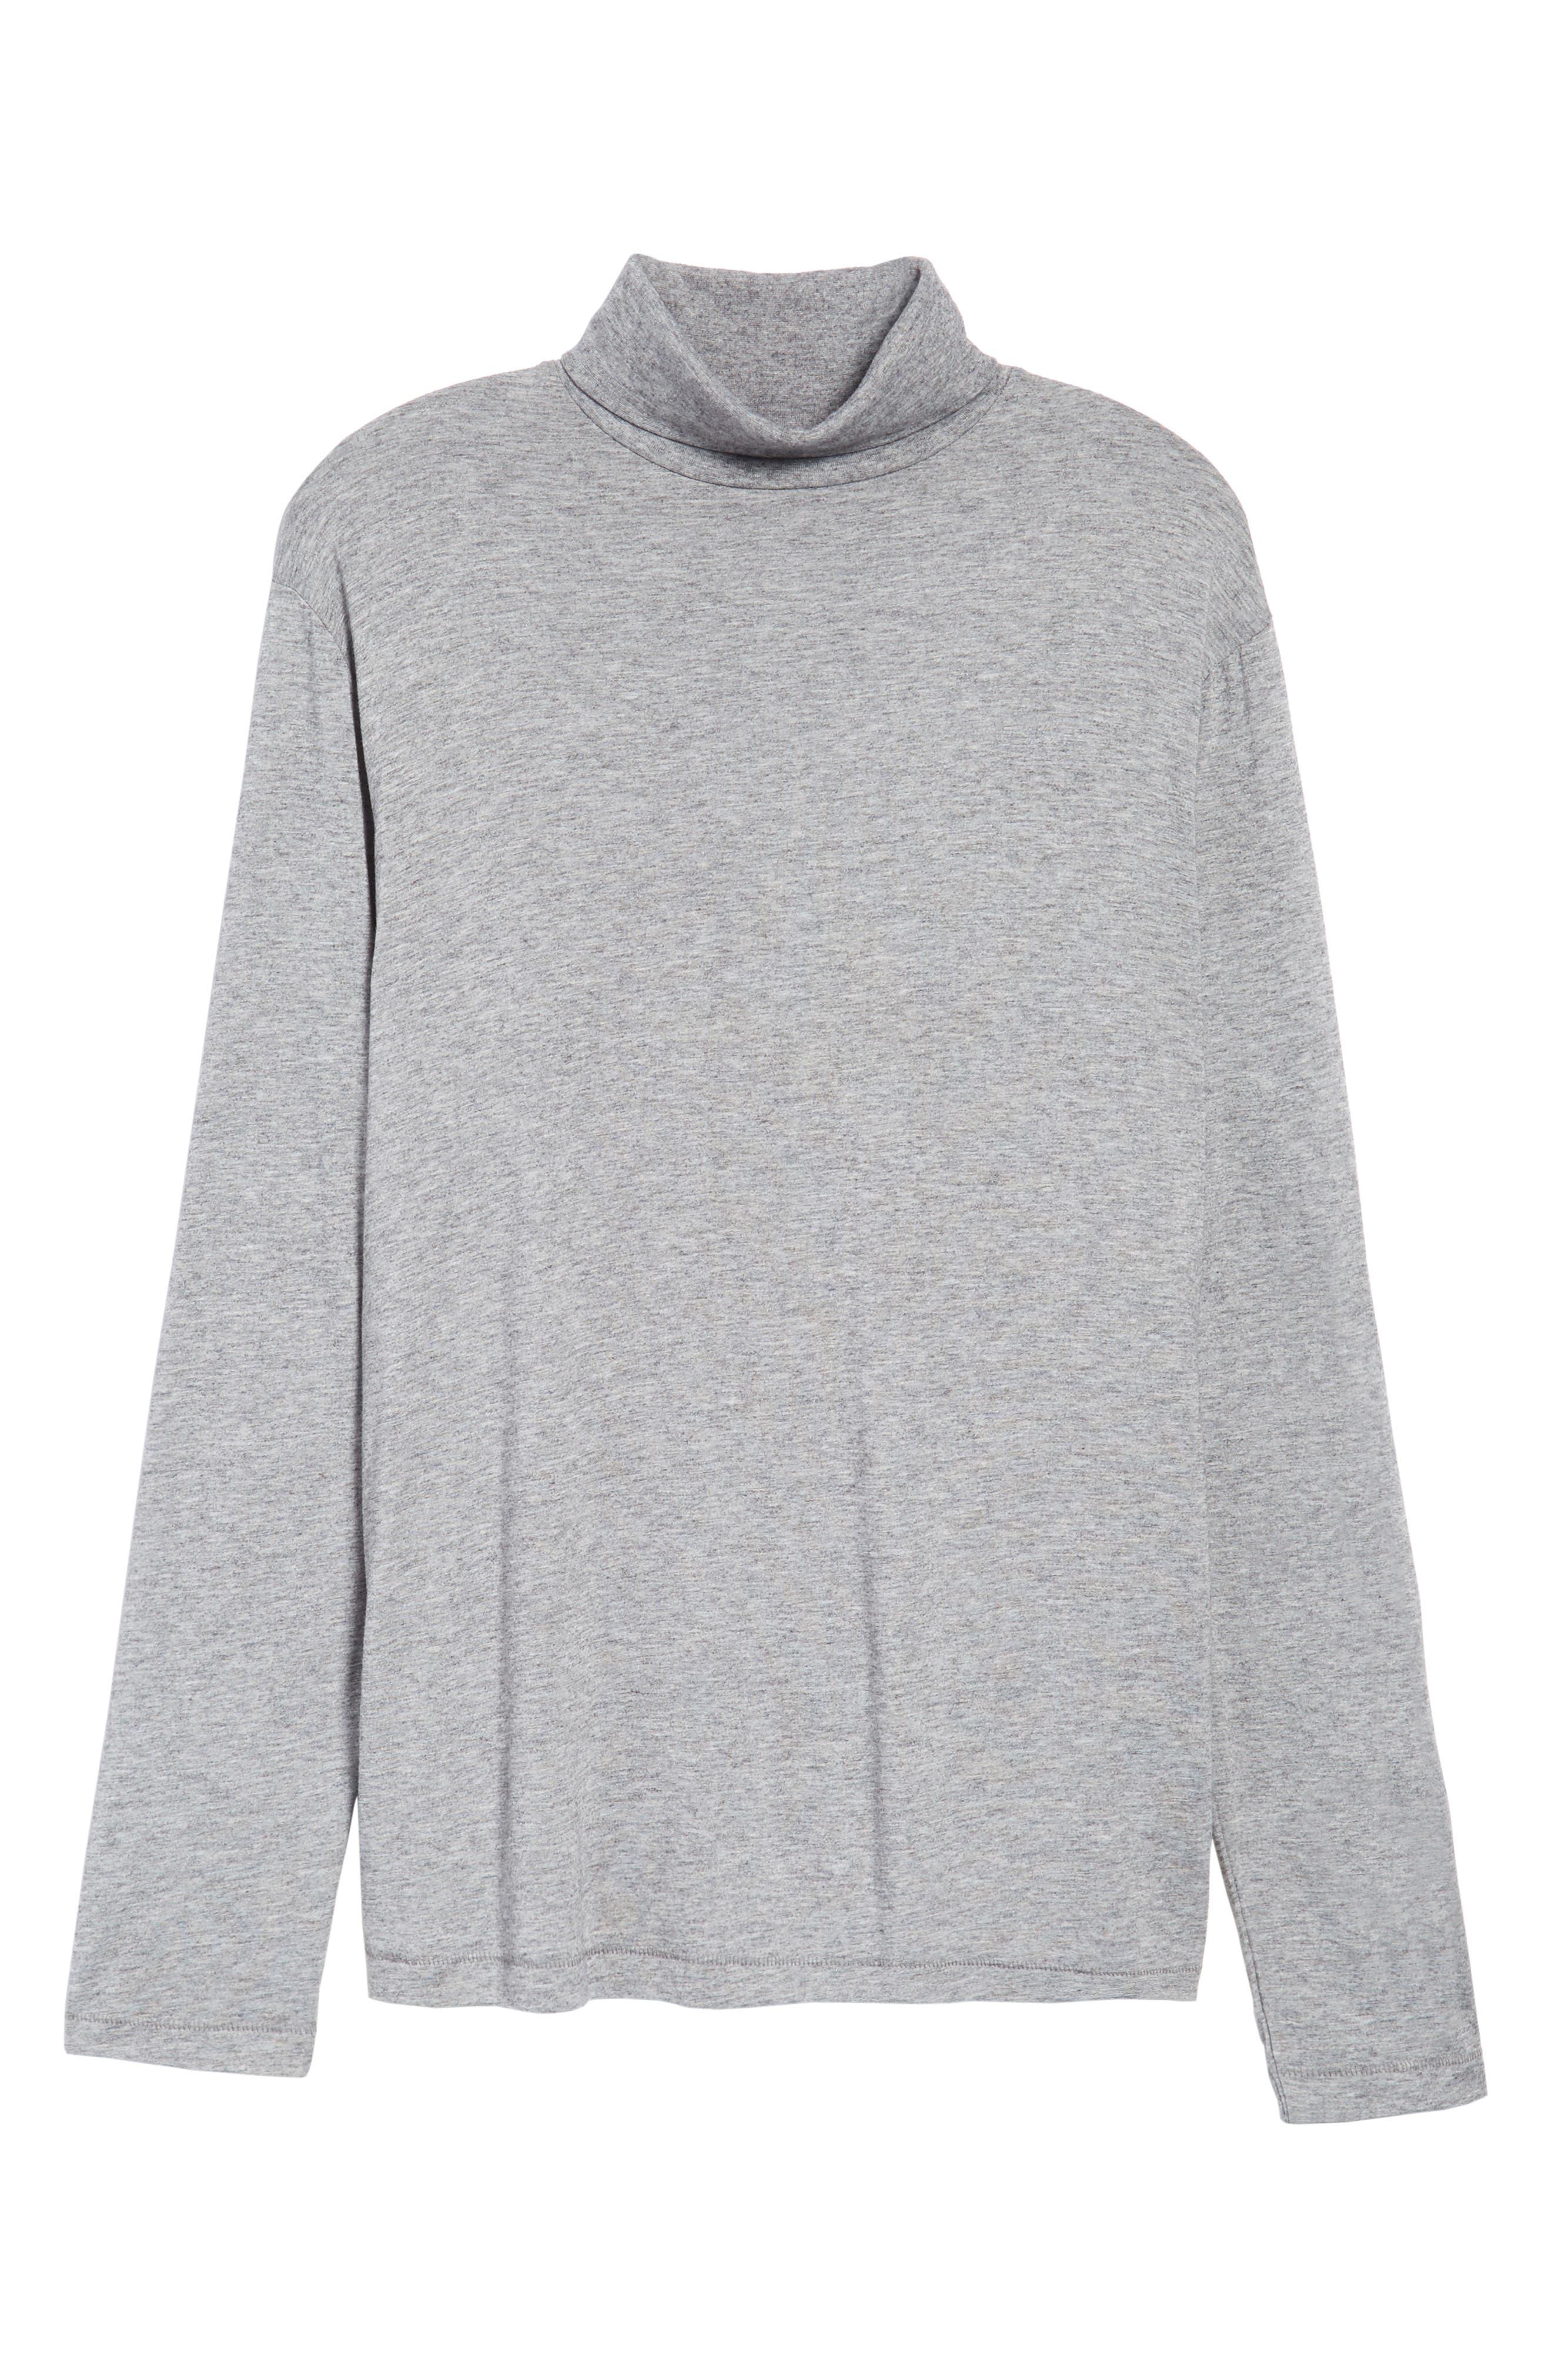 Lightweight Turtleneck Sweater,                             Alternate thumbnail 6, color,                             Grey Melange